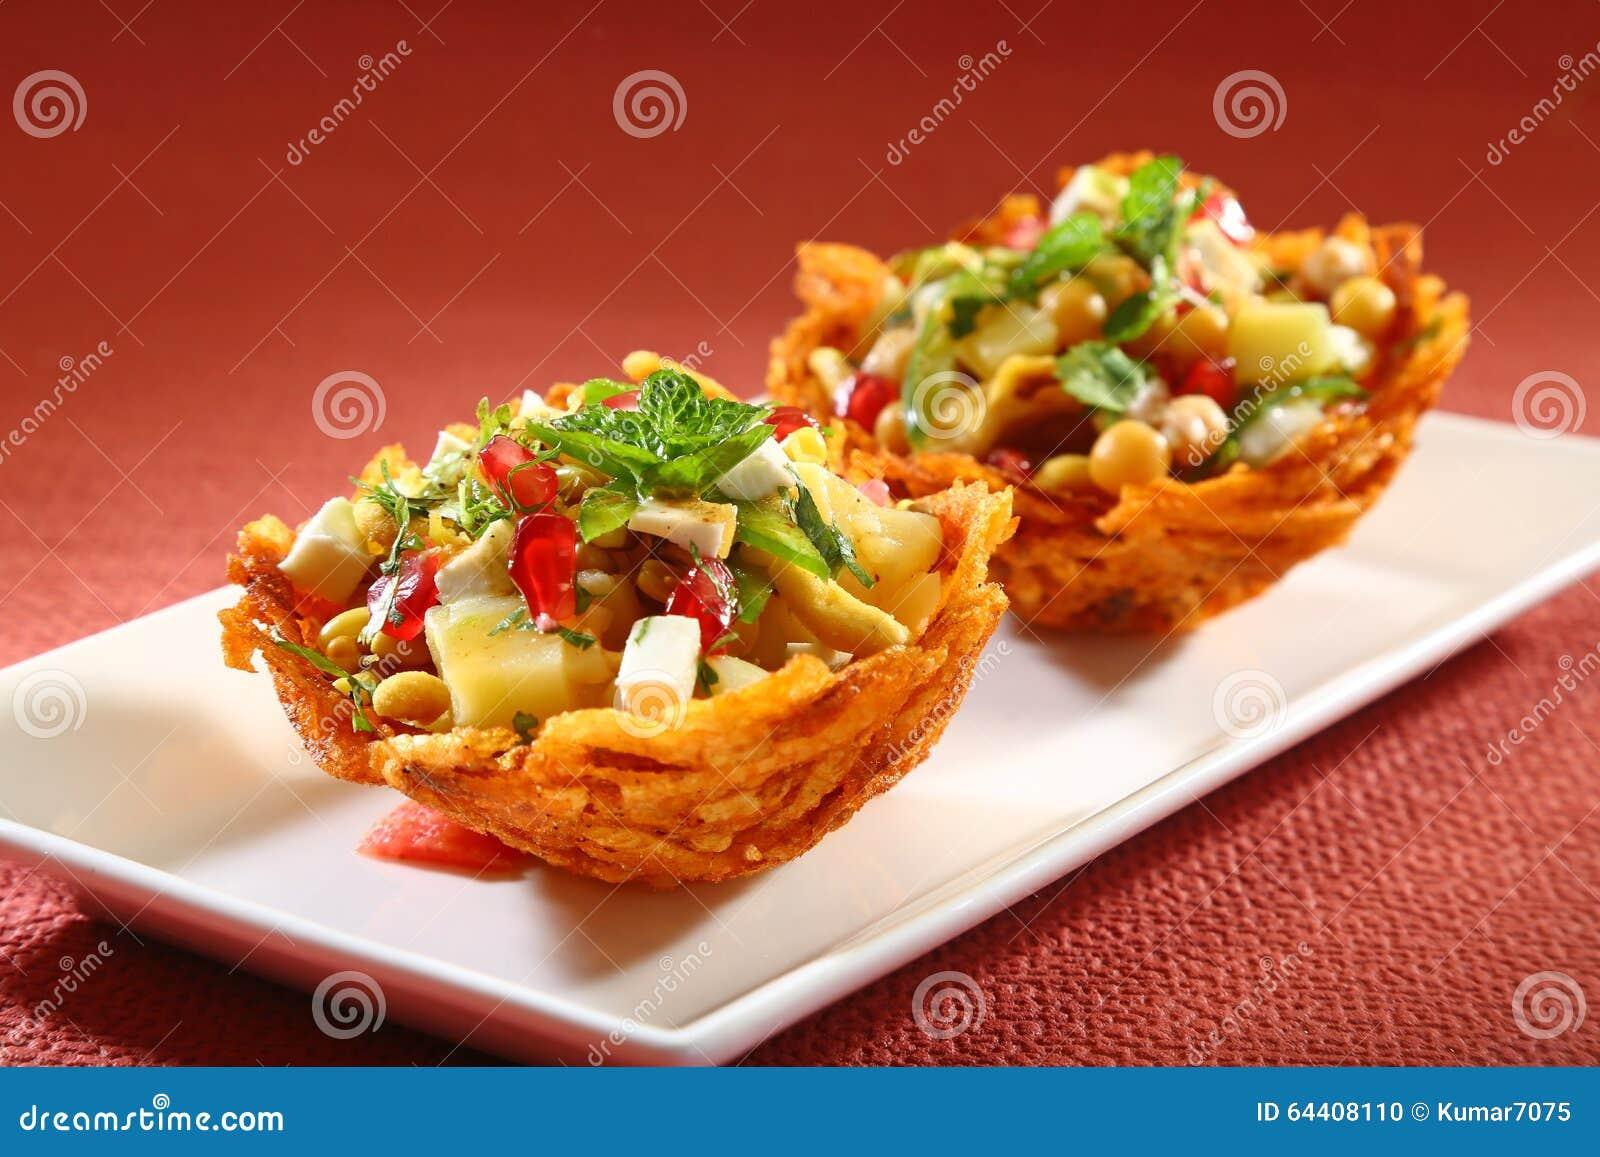 Laccha Tokri Chaat of Aardappelmand met aardappel wordt gevuld die